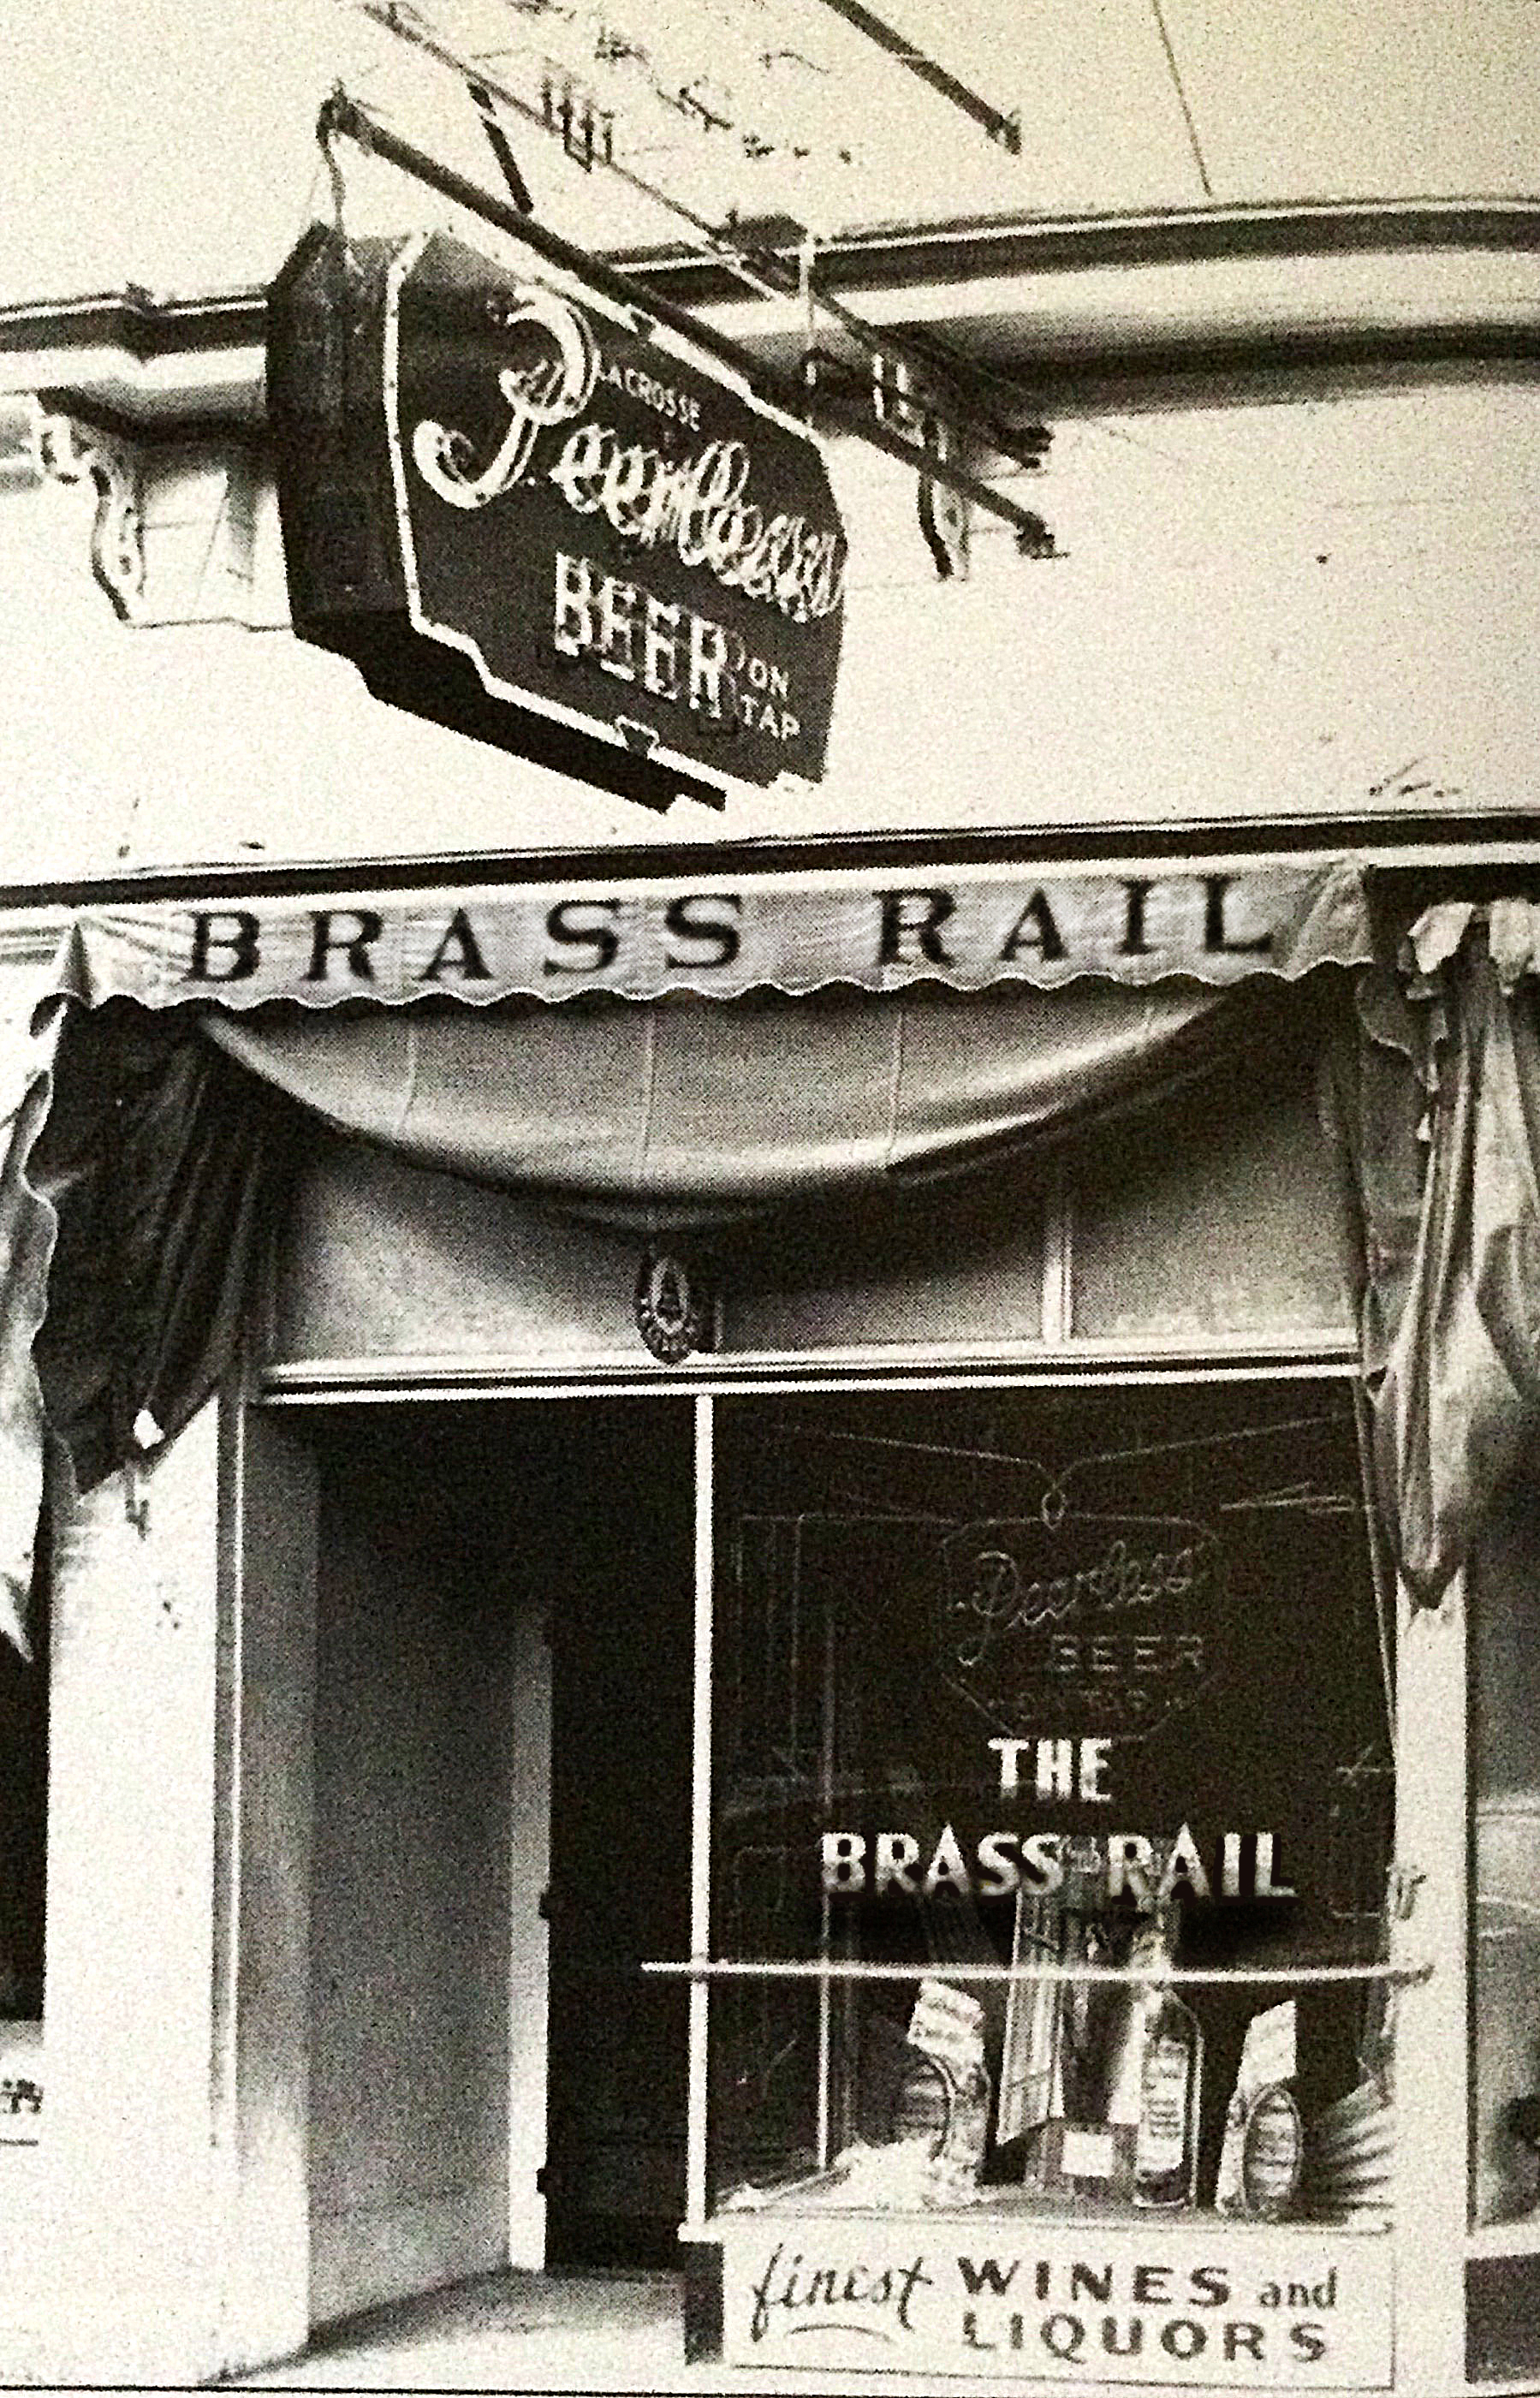 Image - BrassOldPhoto1 (1).jpg